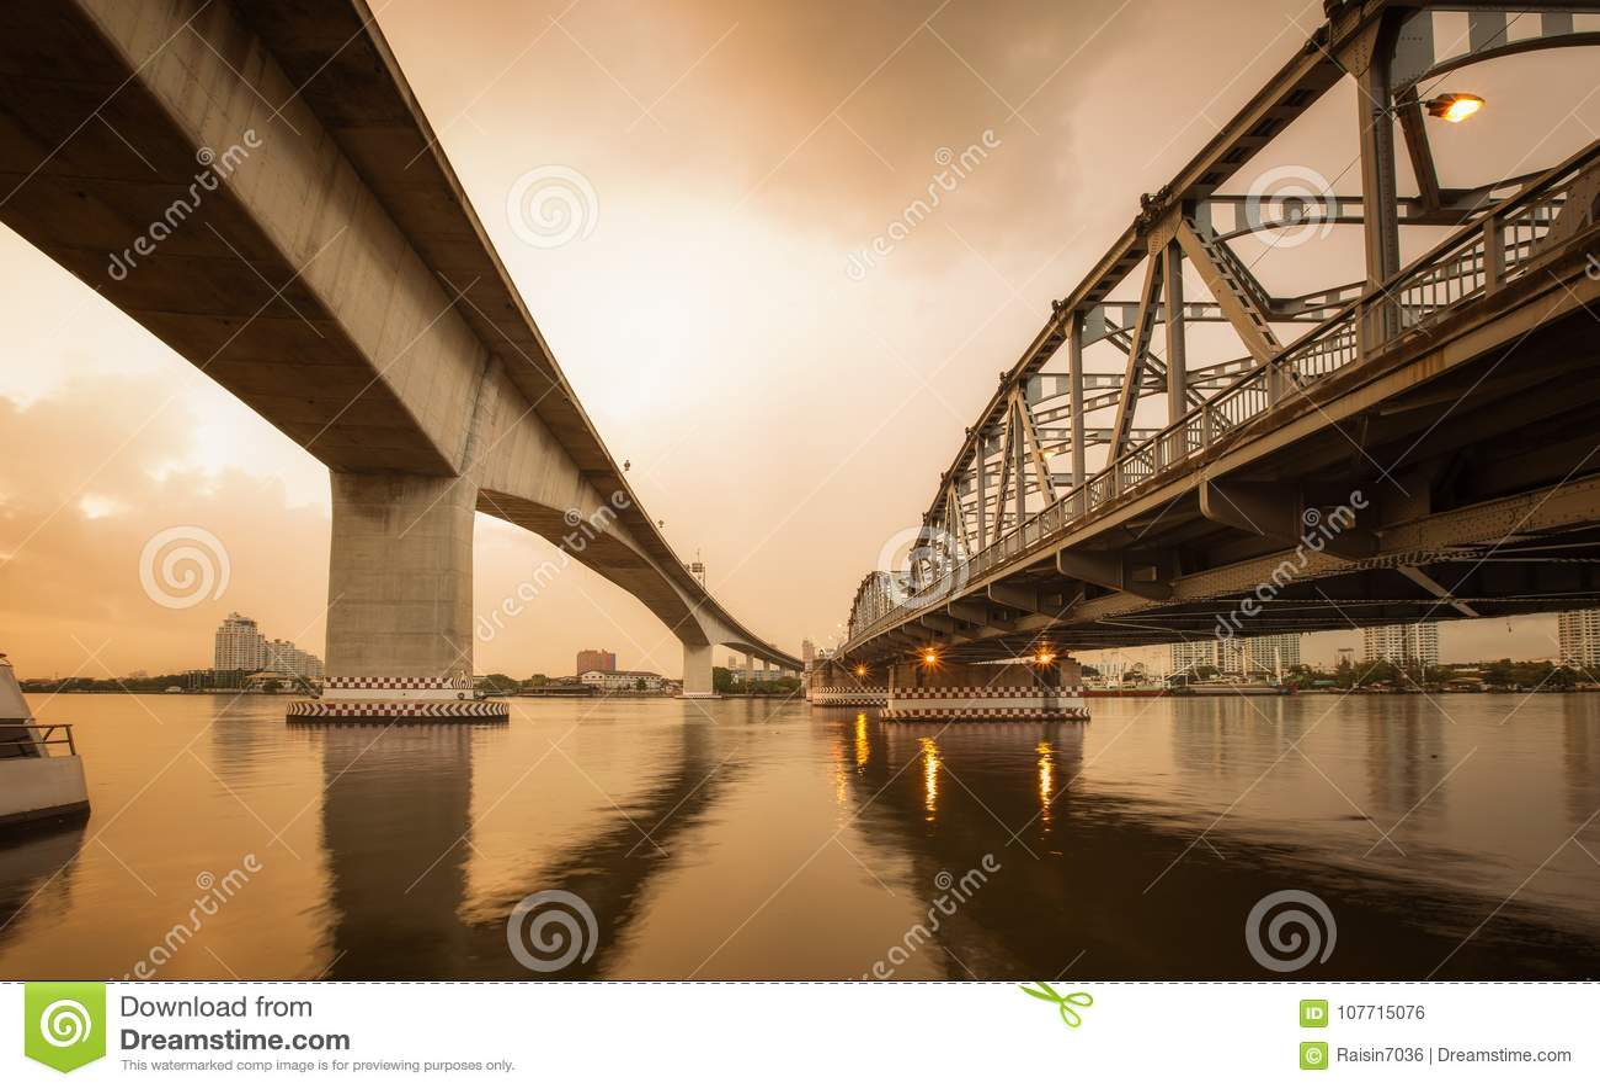 Concrete and metal bridge for transportation concept background.